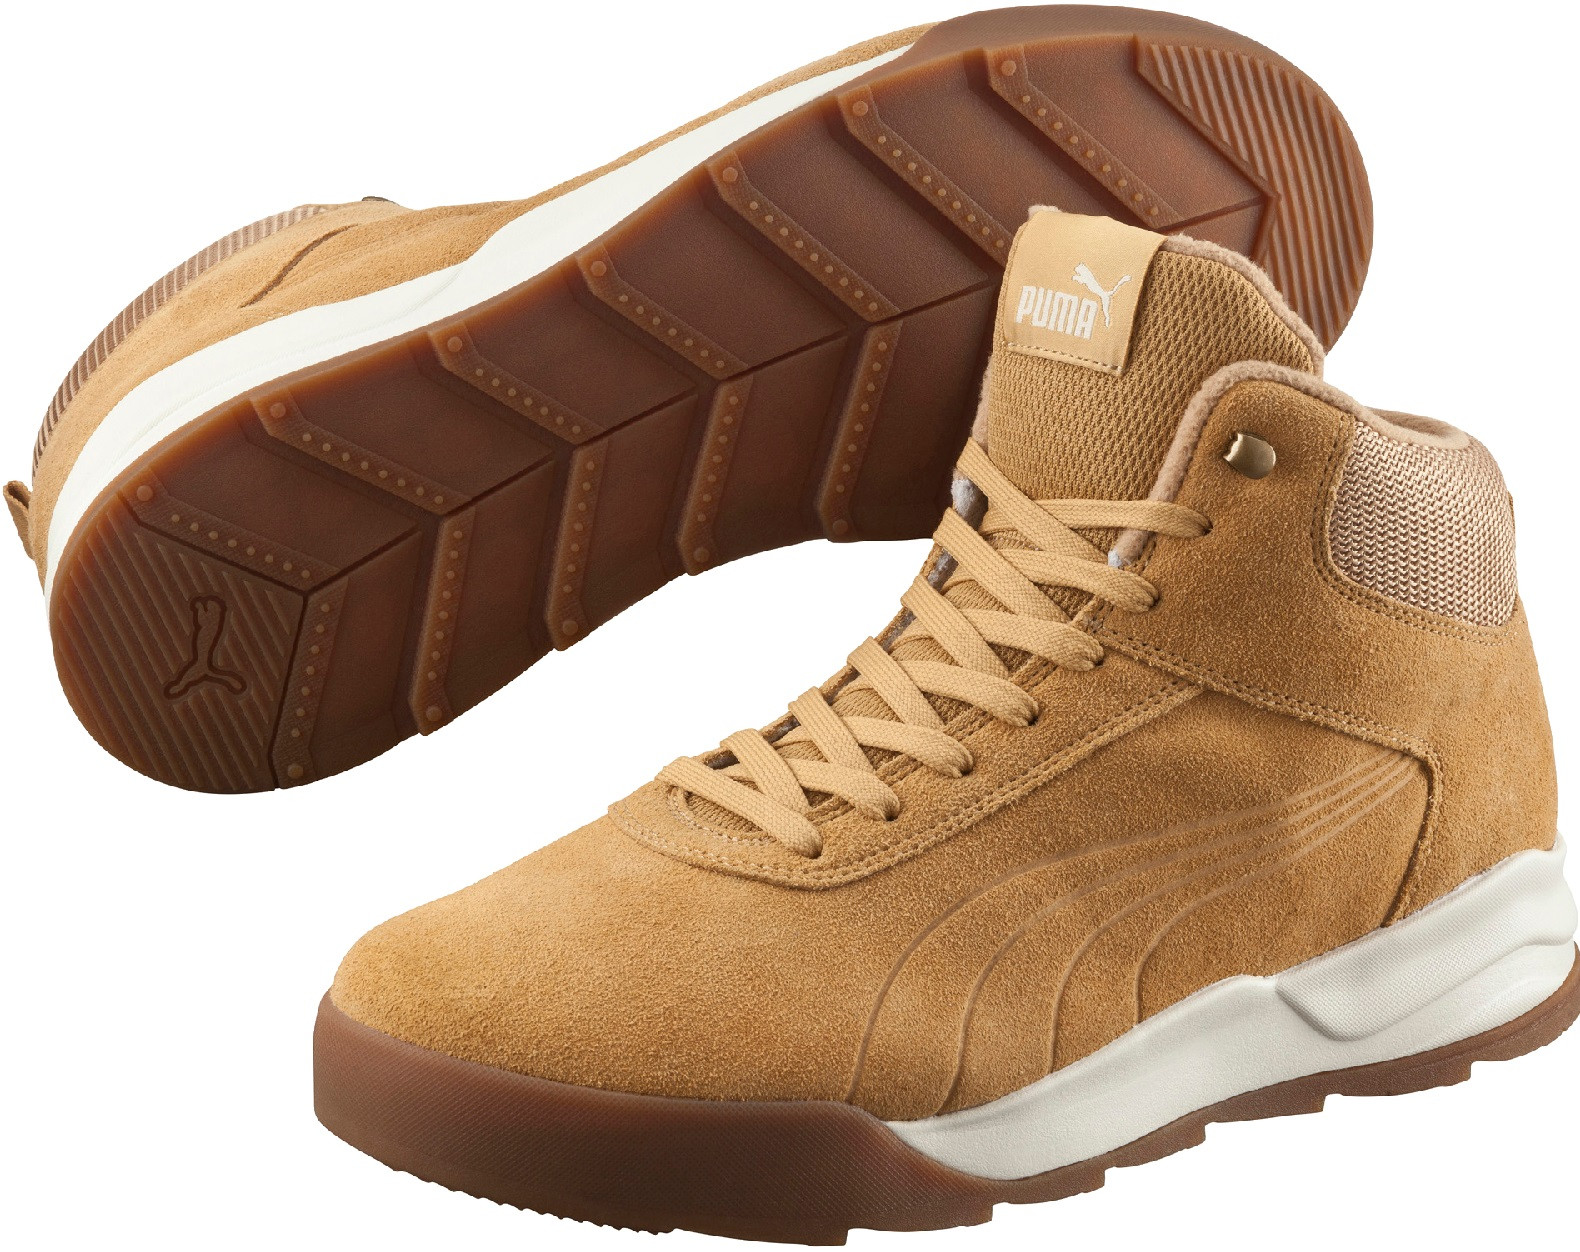 Puma Shoes Desierto Sneaker Taffy Taff